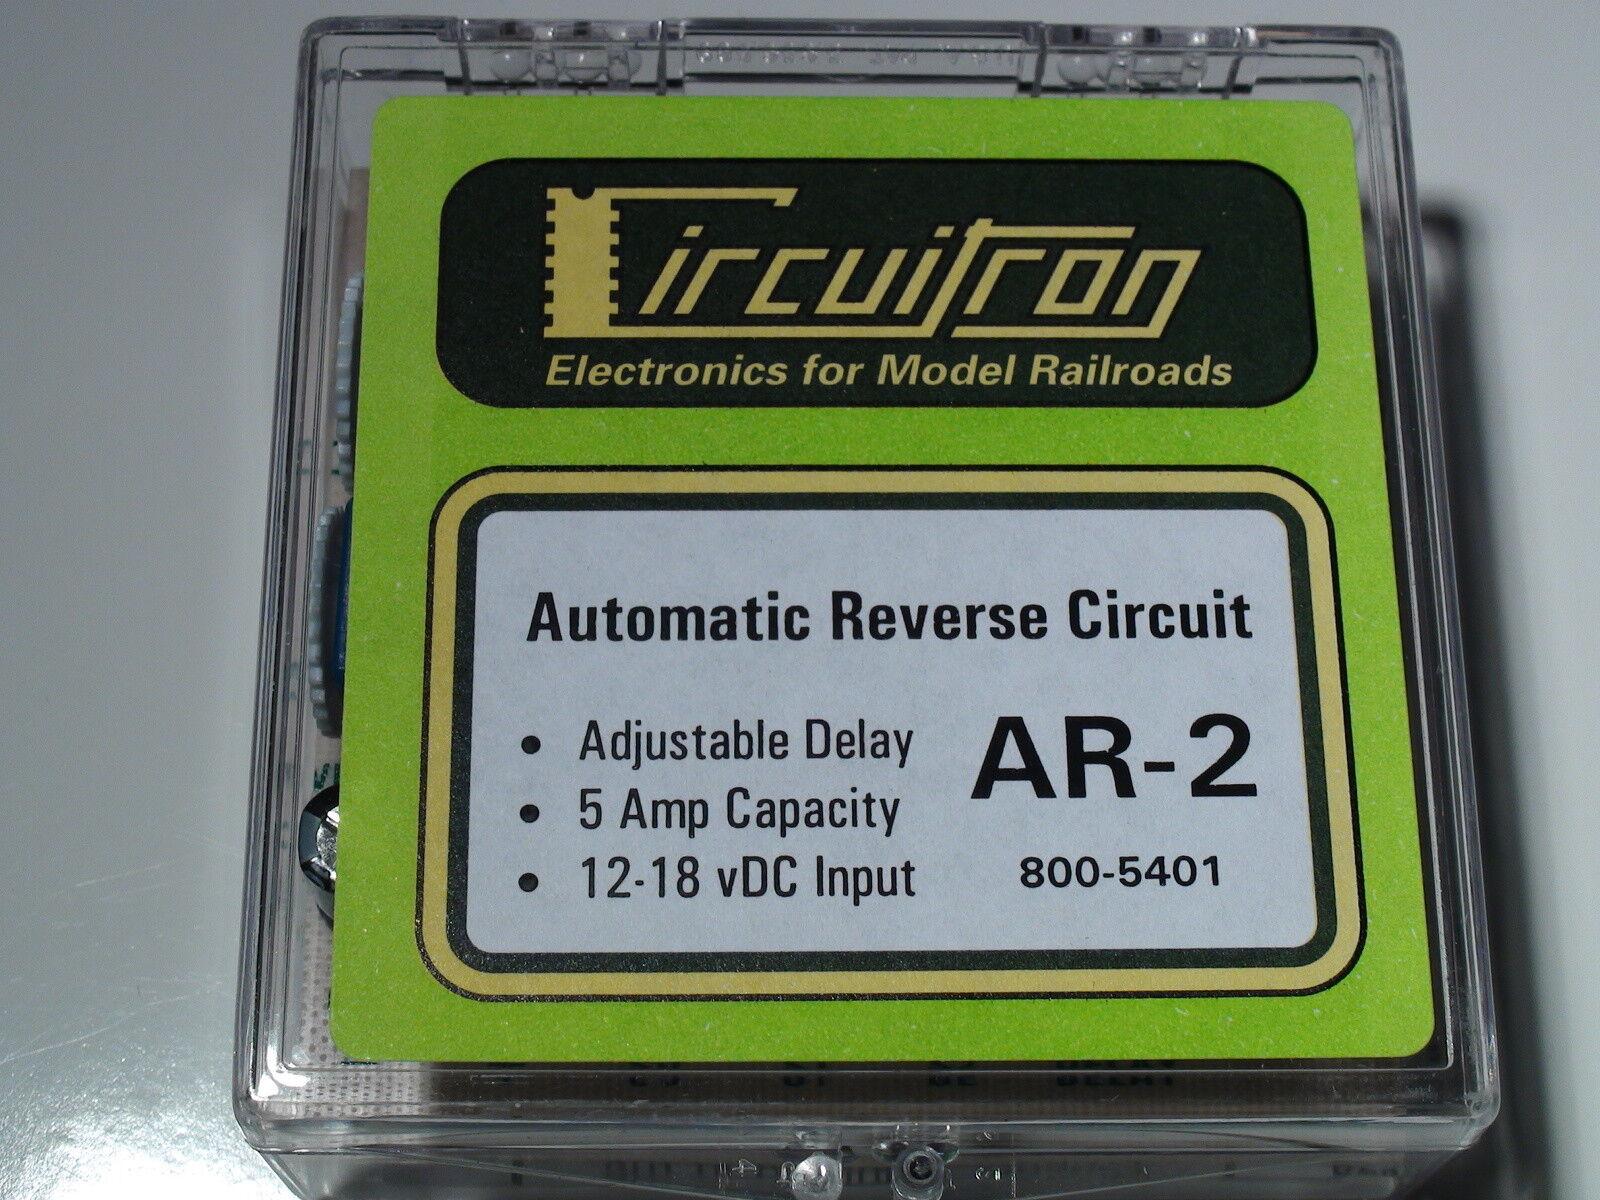 CIRCUITRON 800-5401 AR-2 AUTOMATIC REVERSE CIRCUIT BIGDISCOUNTTRAINS